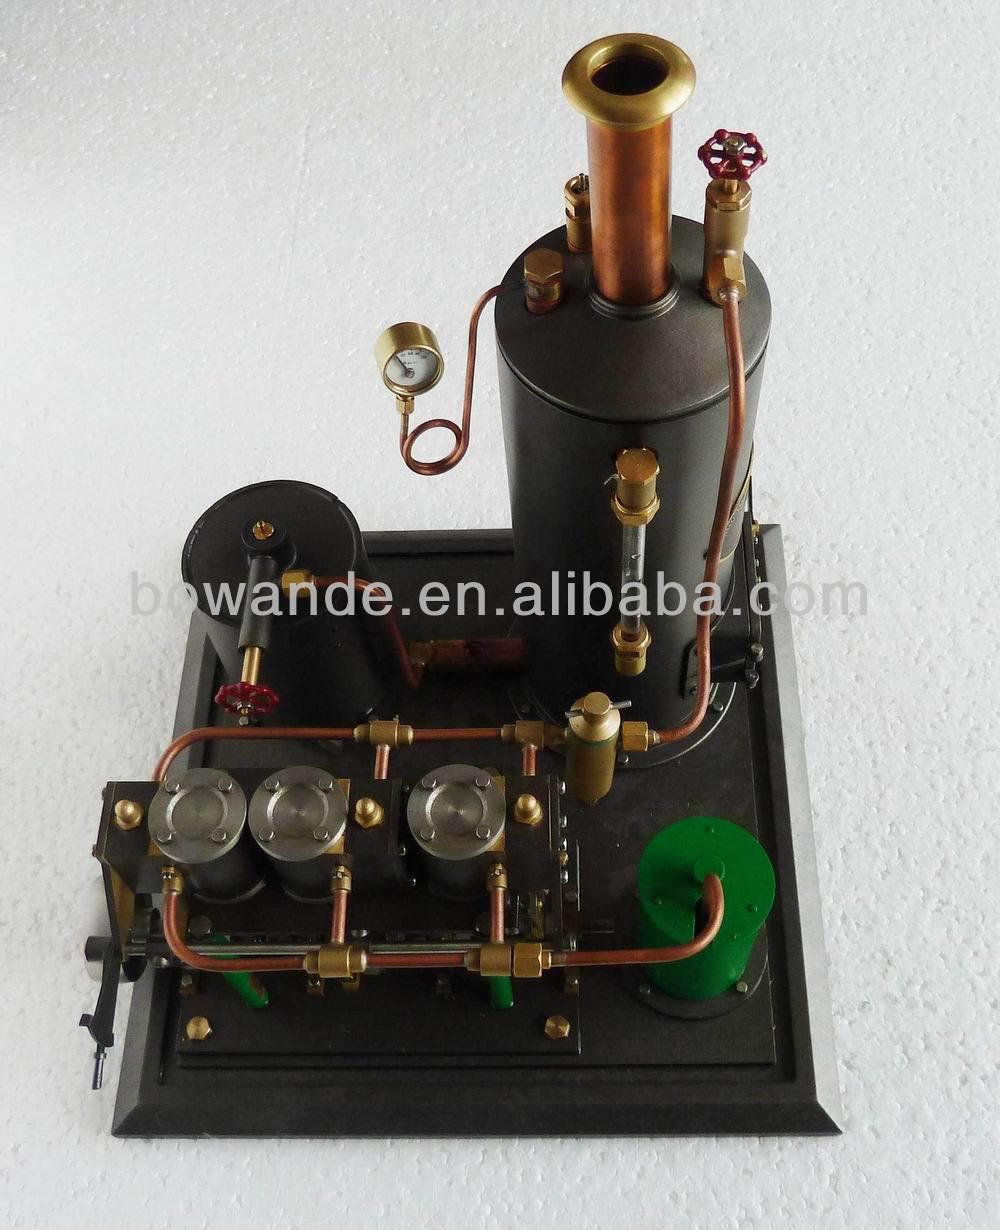 P1100355.JPG